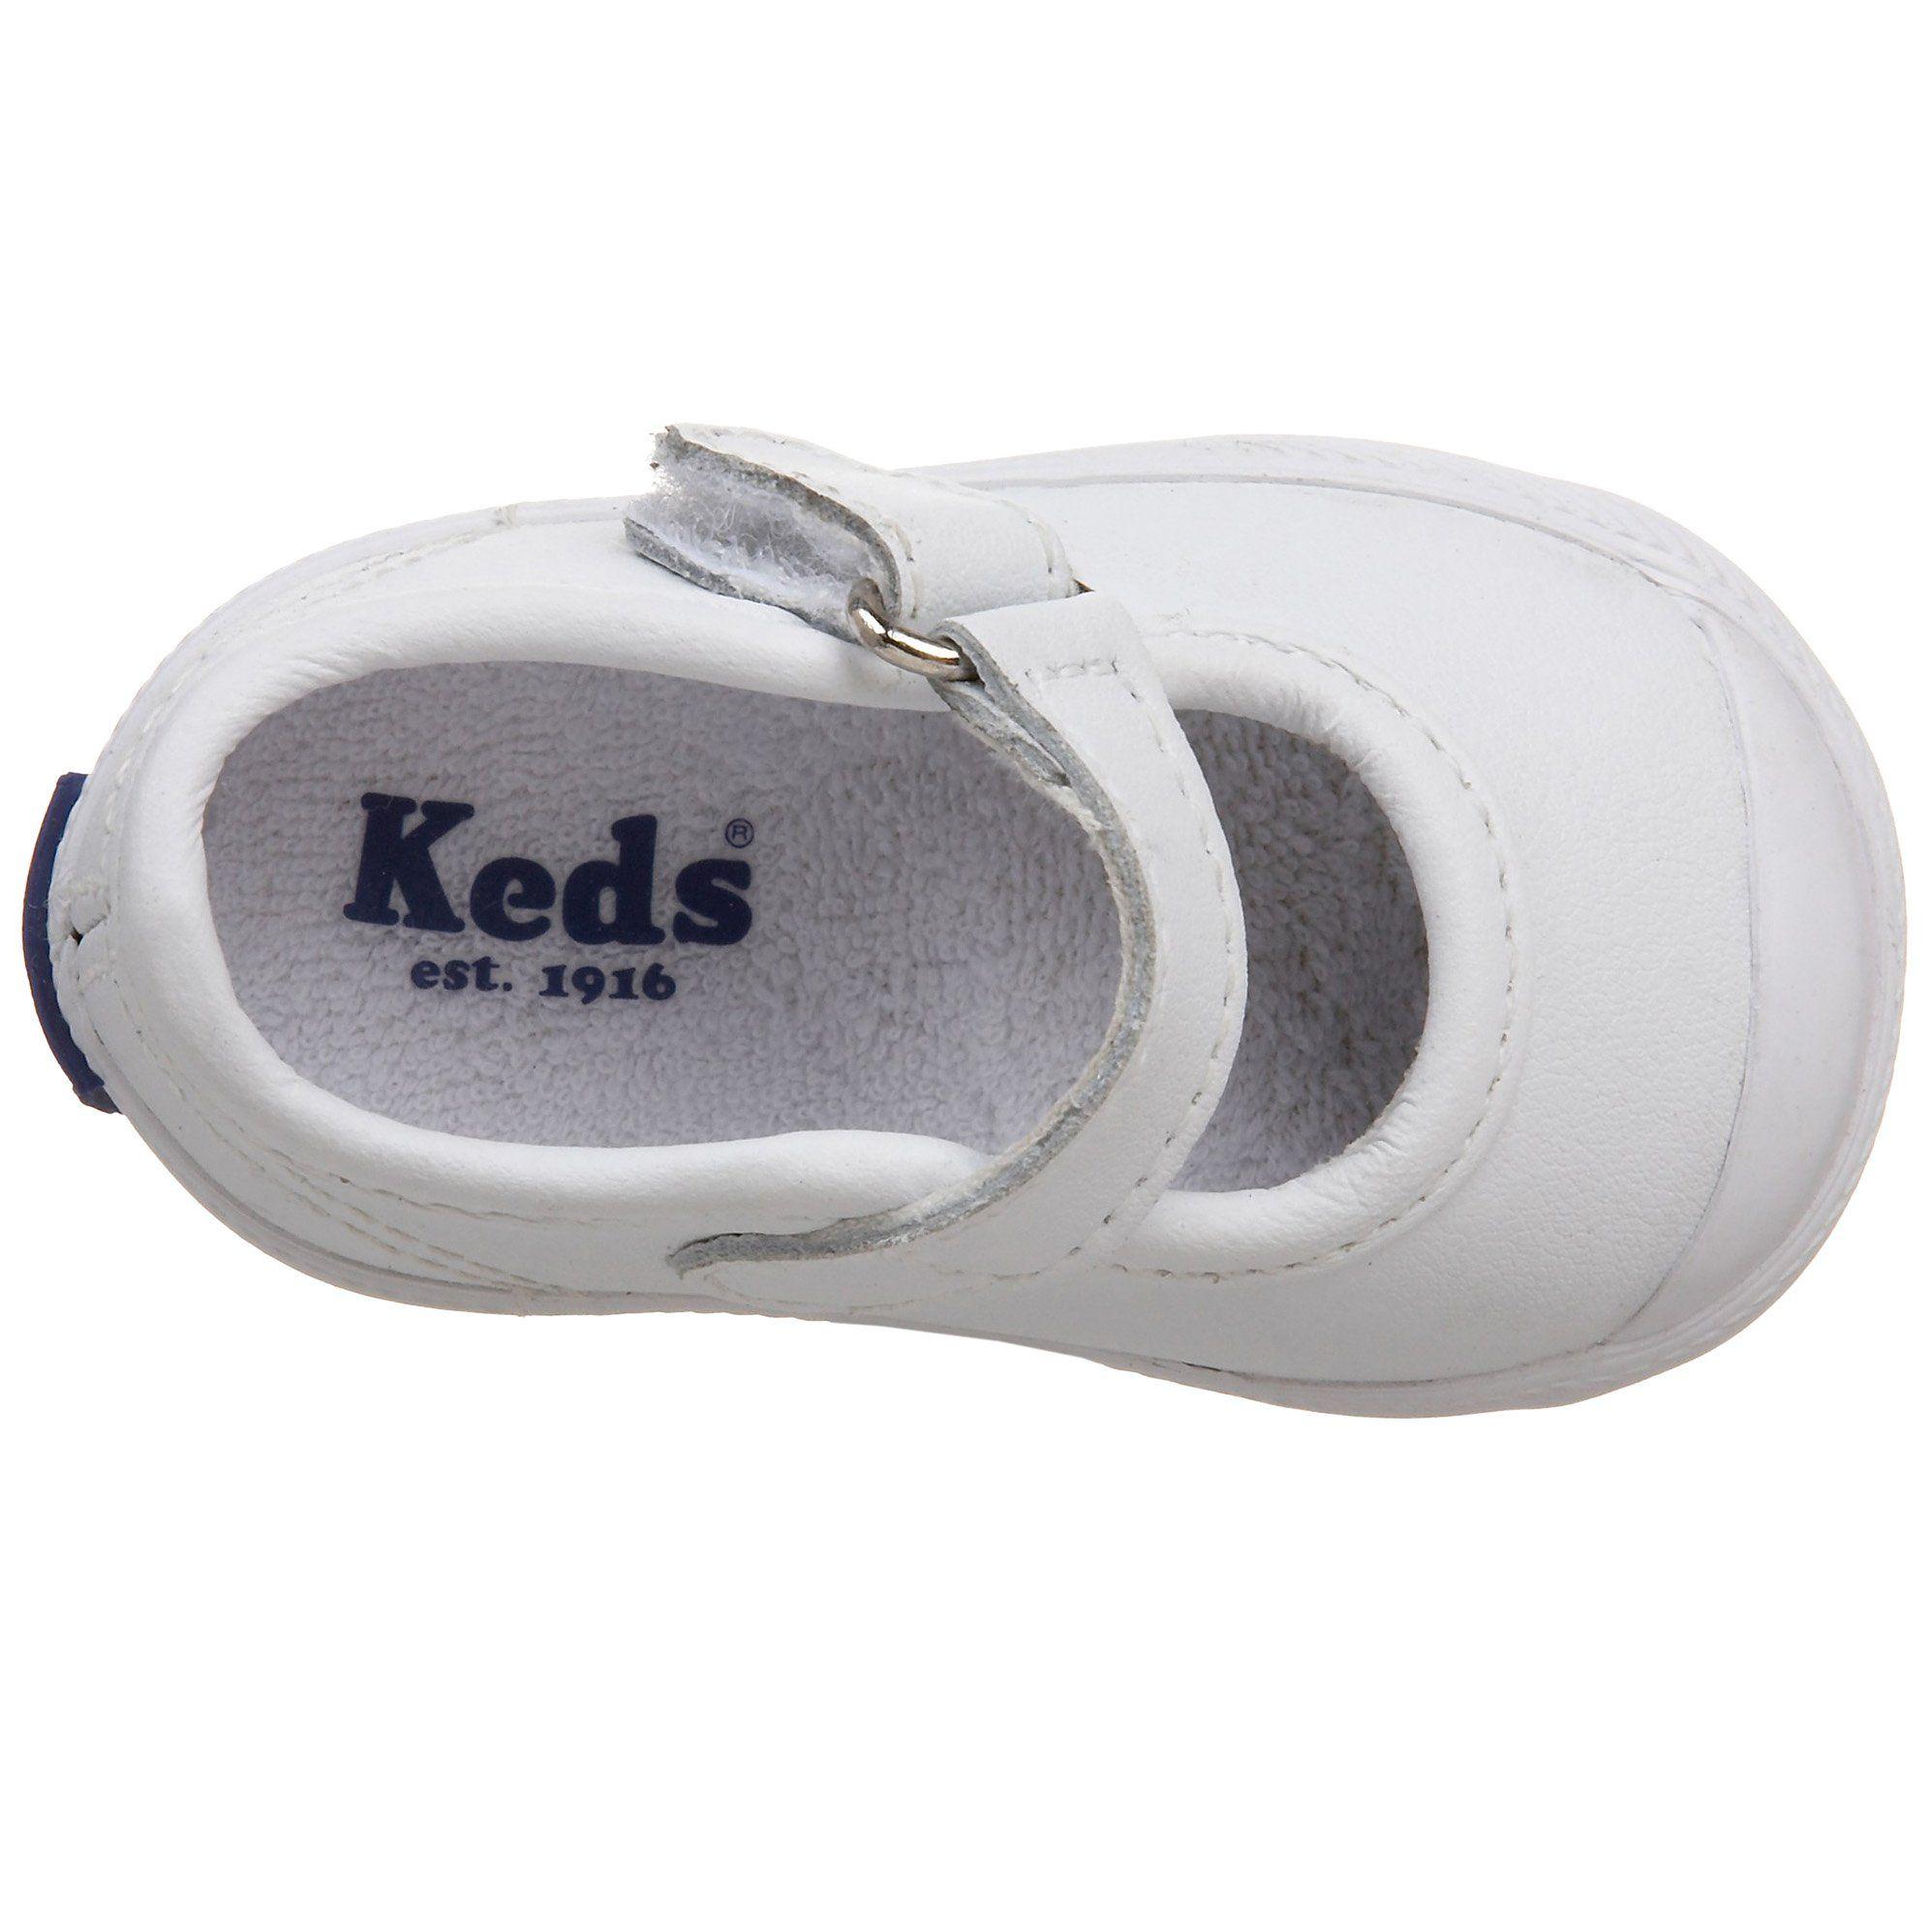 79b5cfa28c0 Keds Champion Toe Cap Mary Jane Sneaker (Infant Toddler)